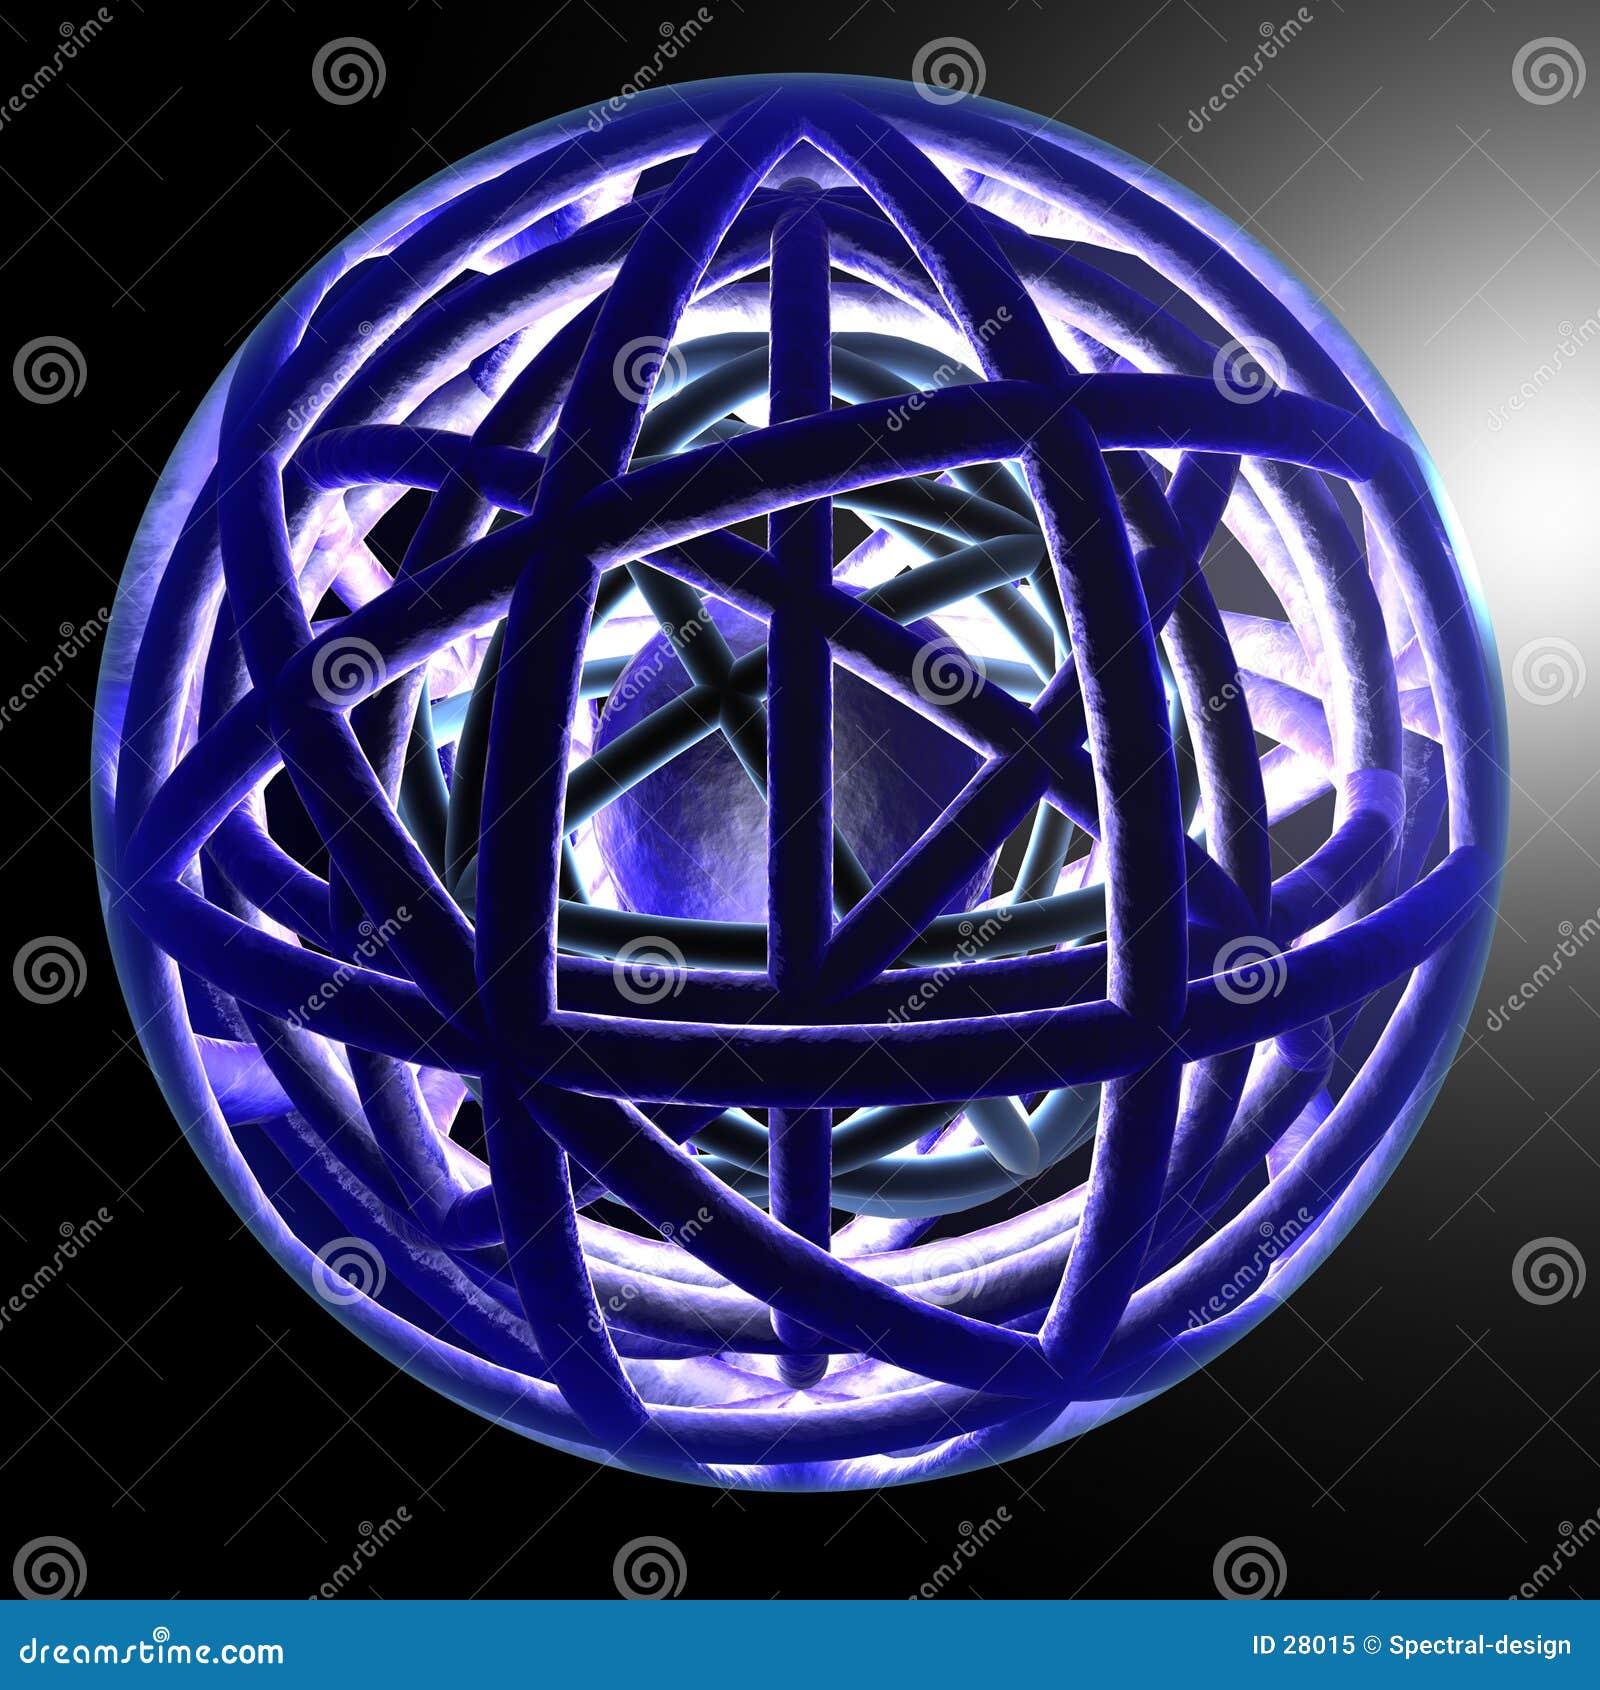 Dynamic Sphere - level 1